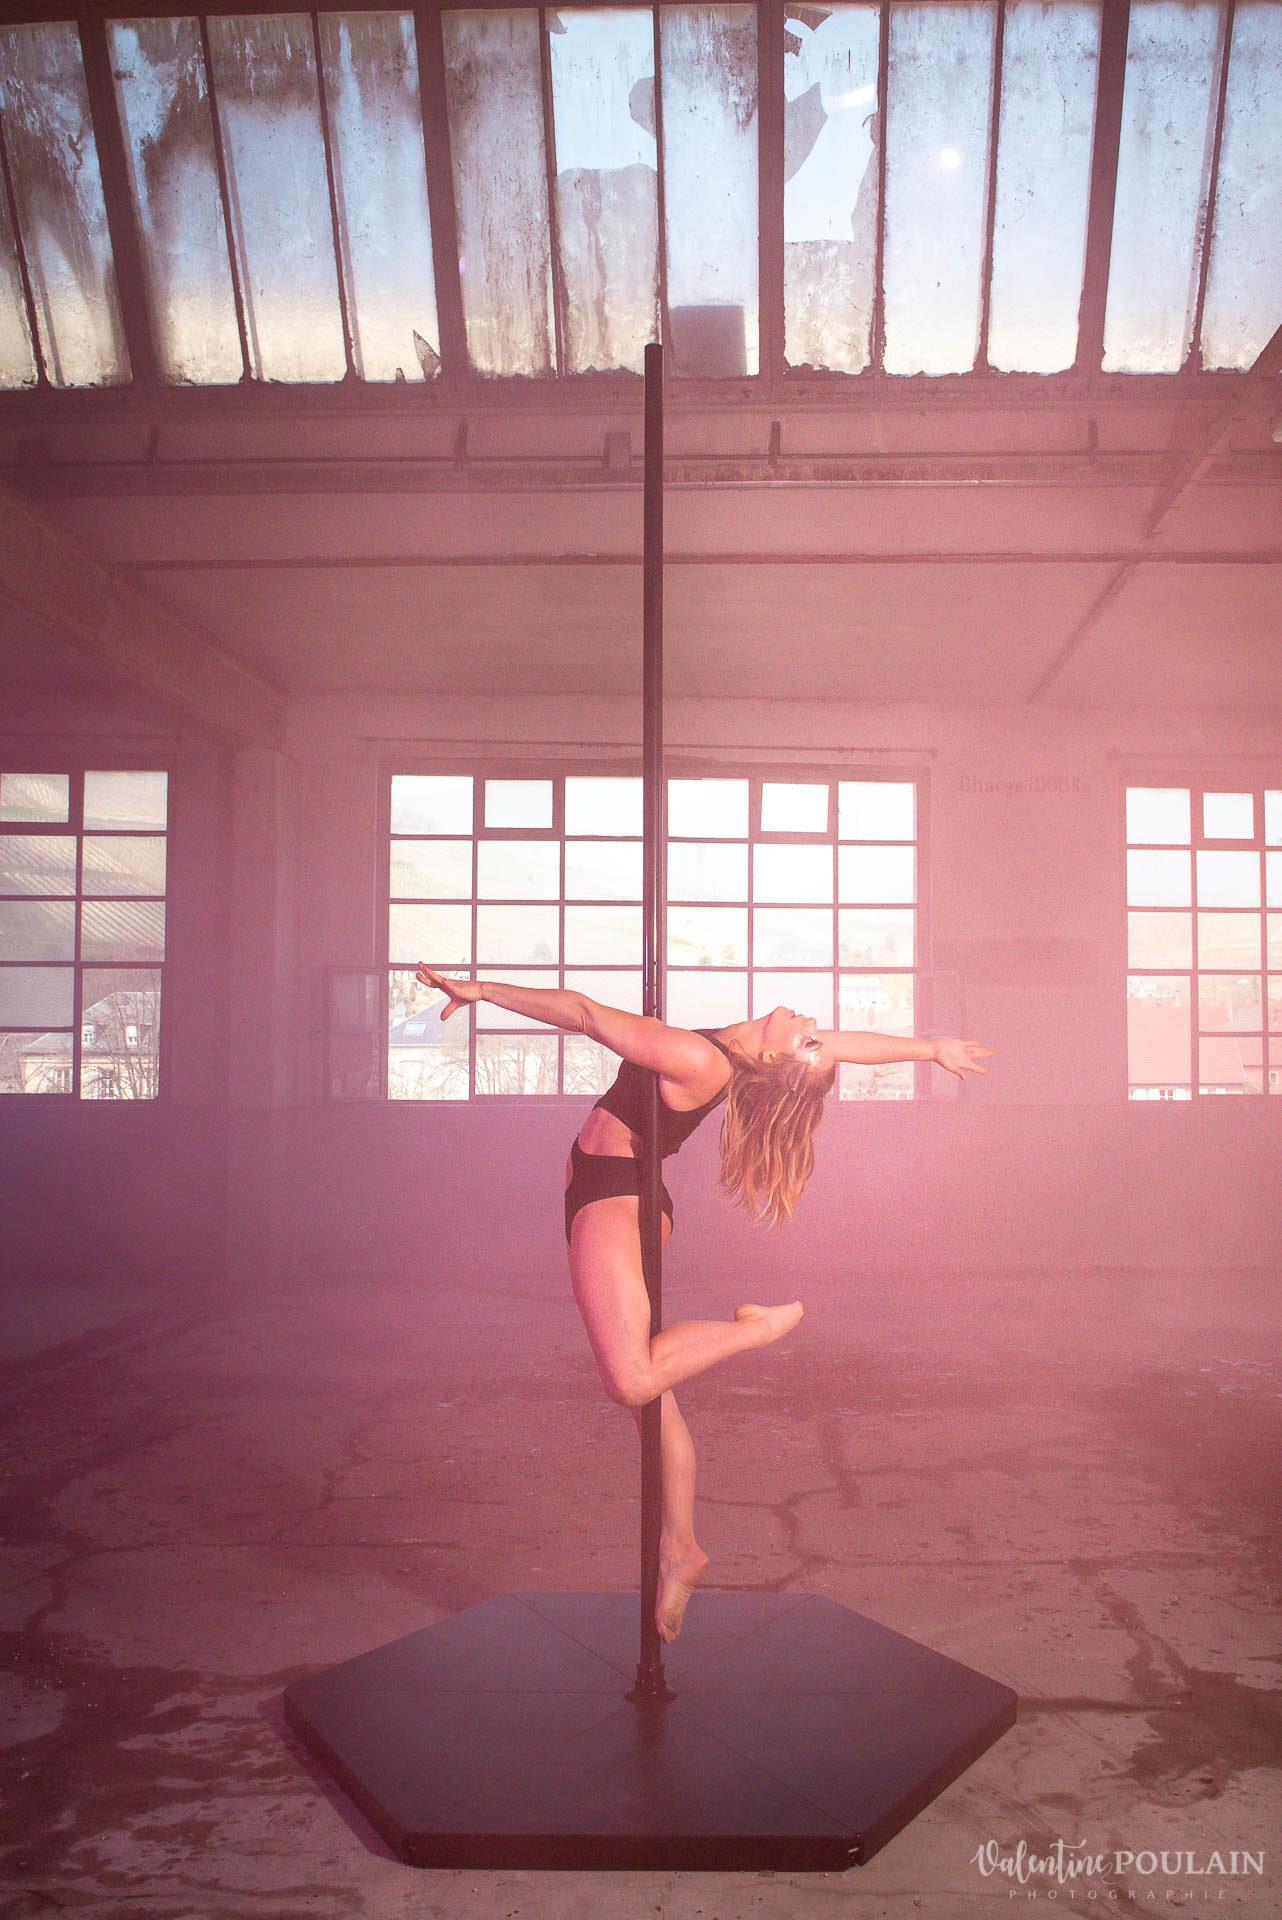 Shooting Pole Dance gymnastique - Valentine Poulain rose